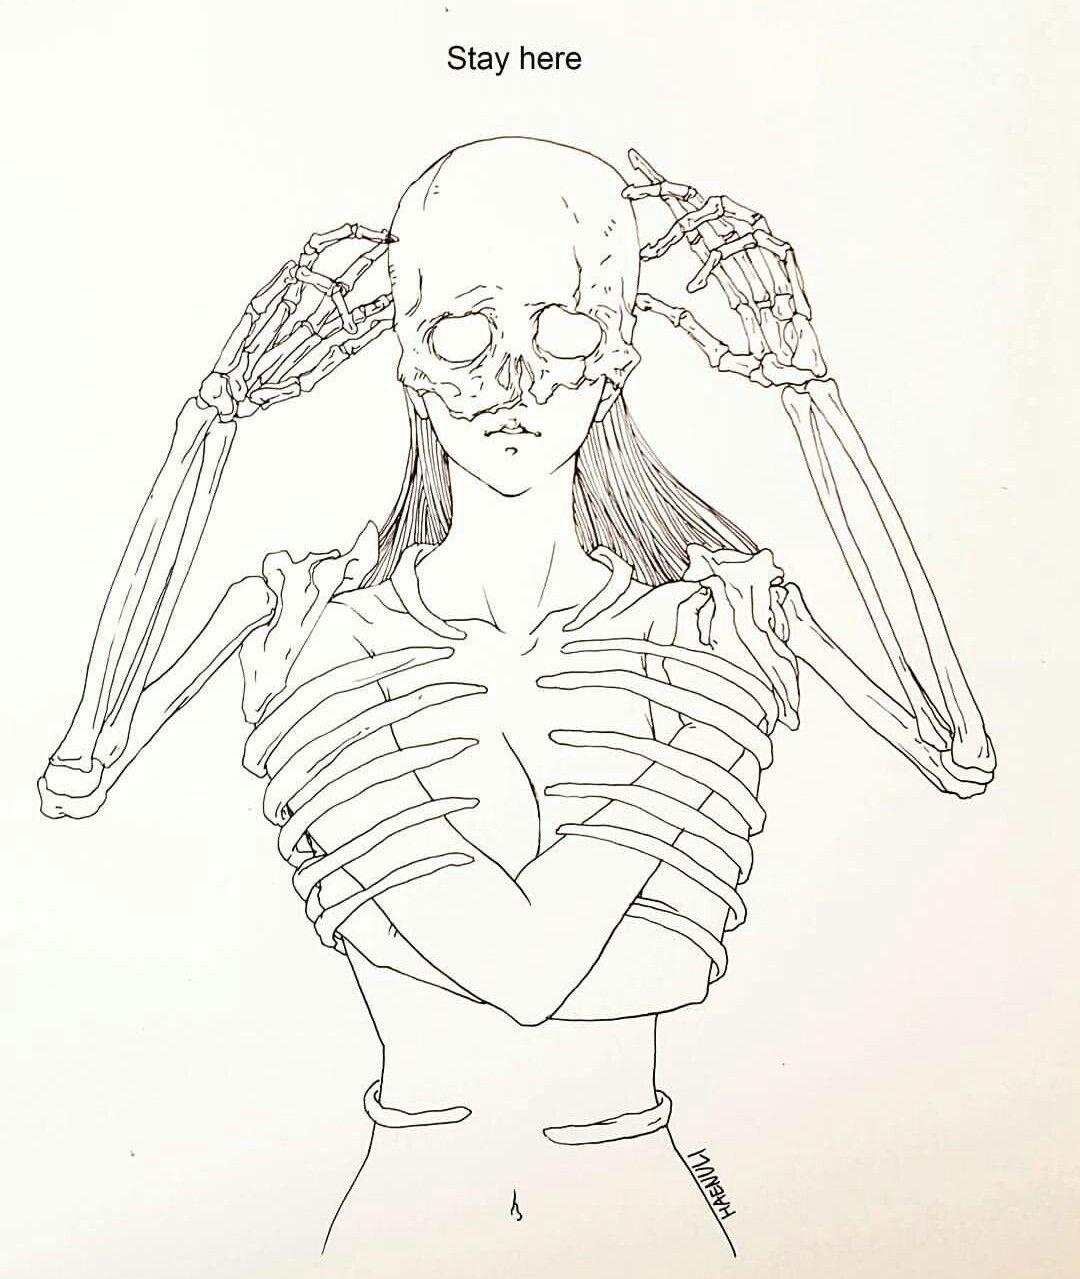 Shin Haenuli Https Www Instagram Com Haenulishop With Images Skeleton Art Illustration Art Art